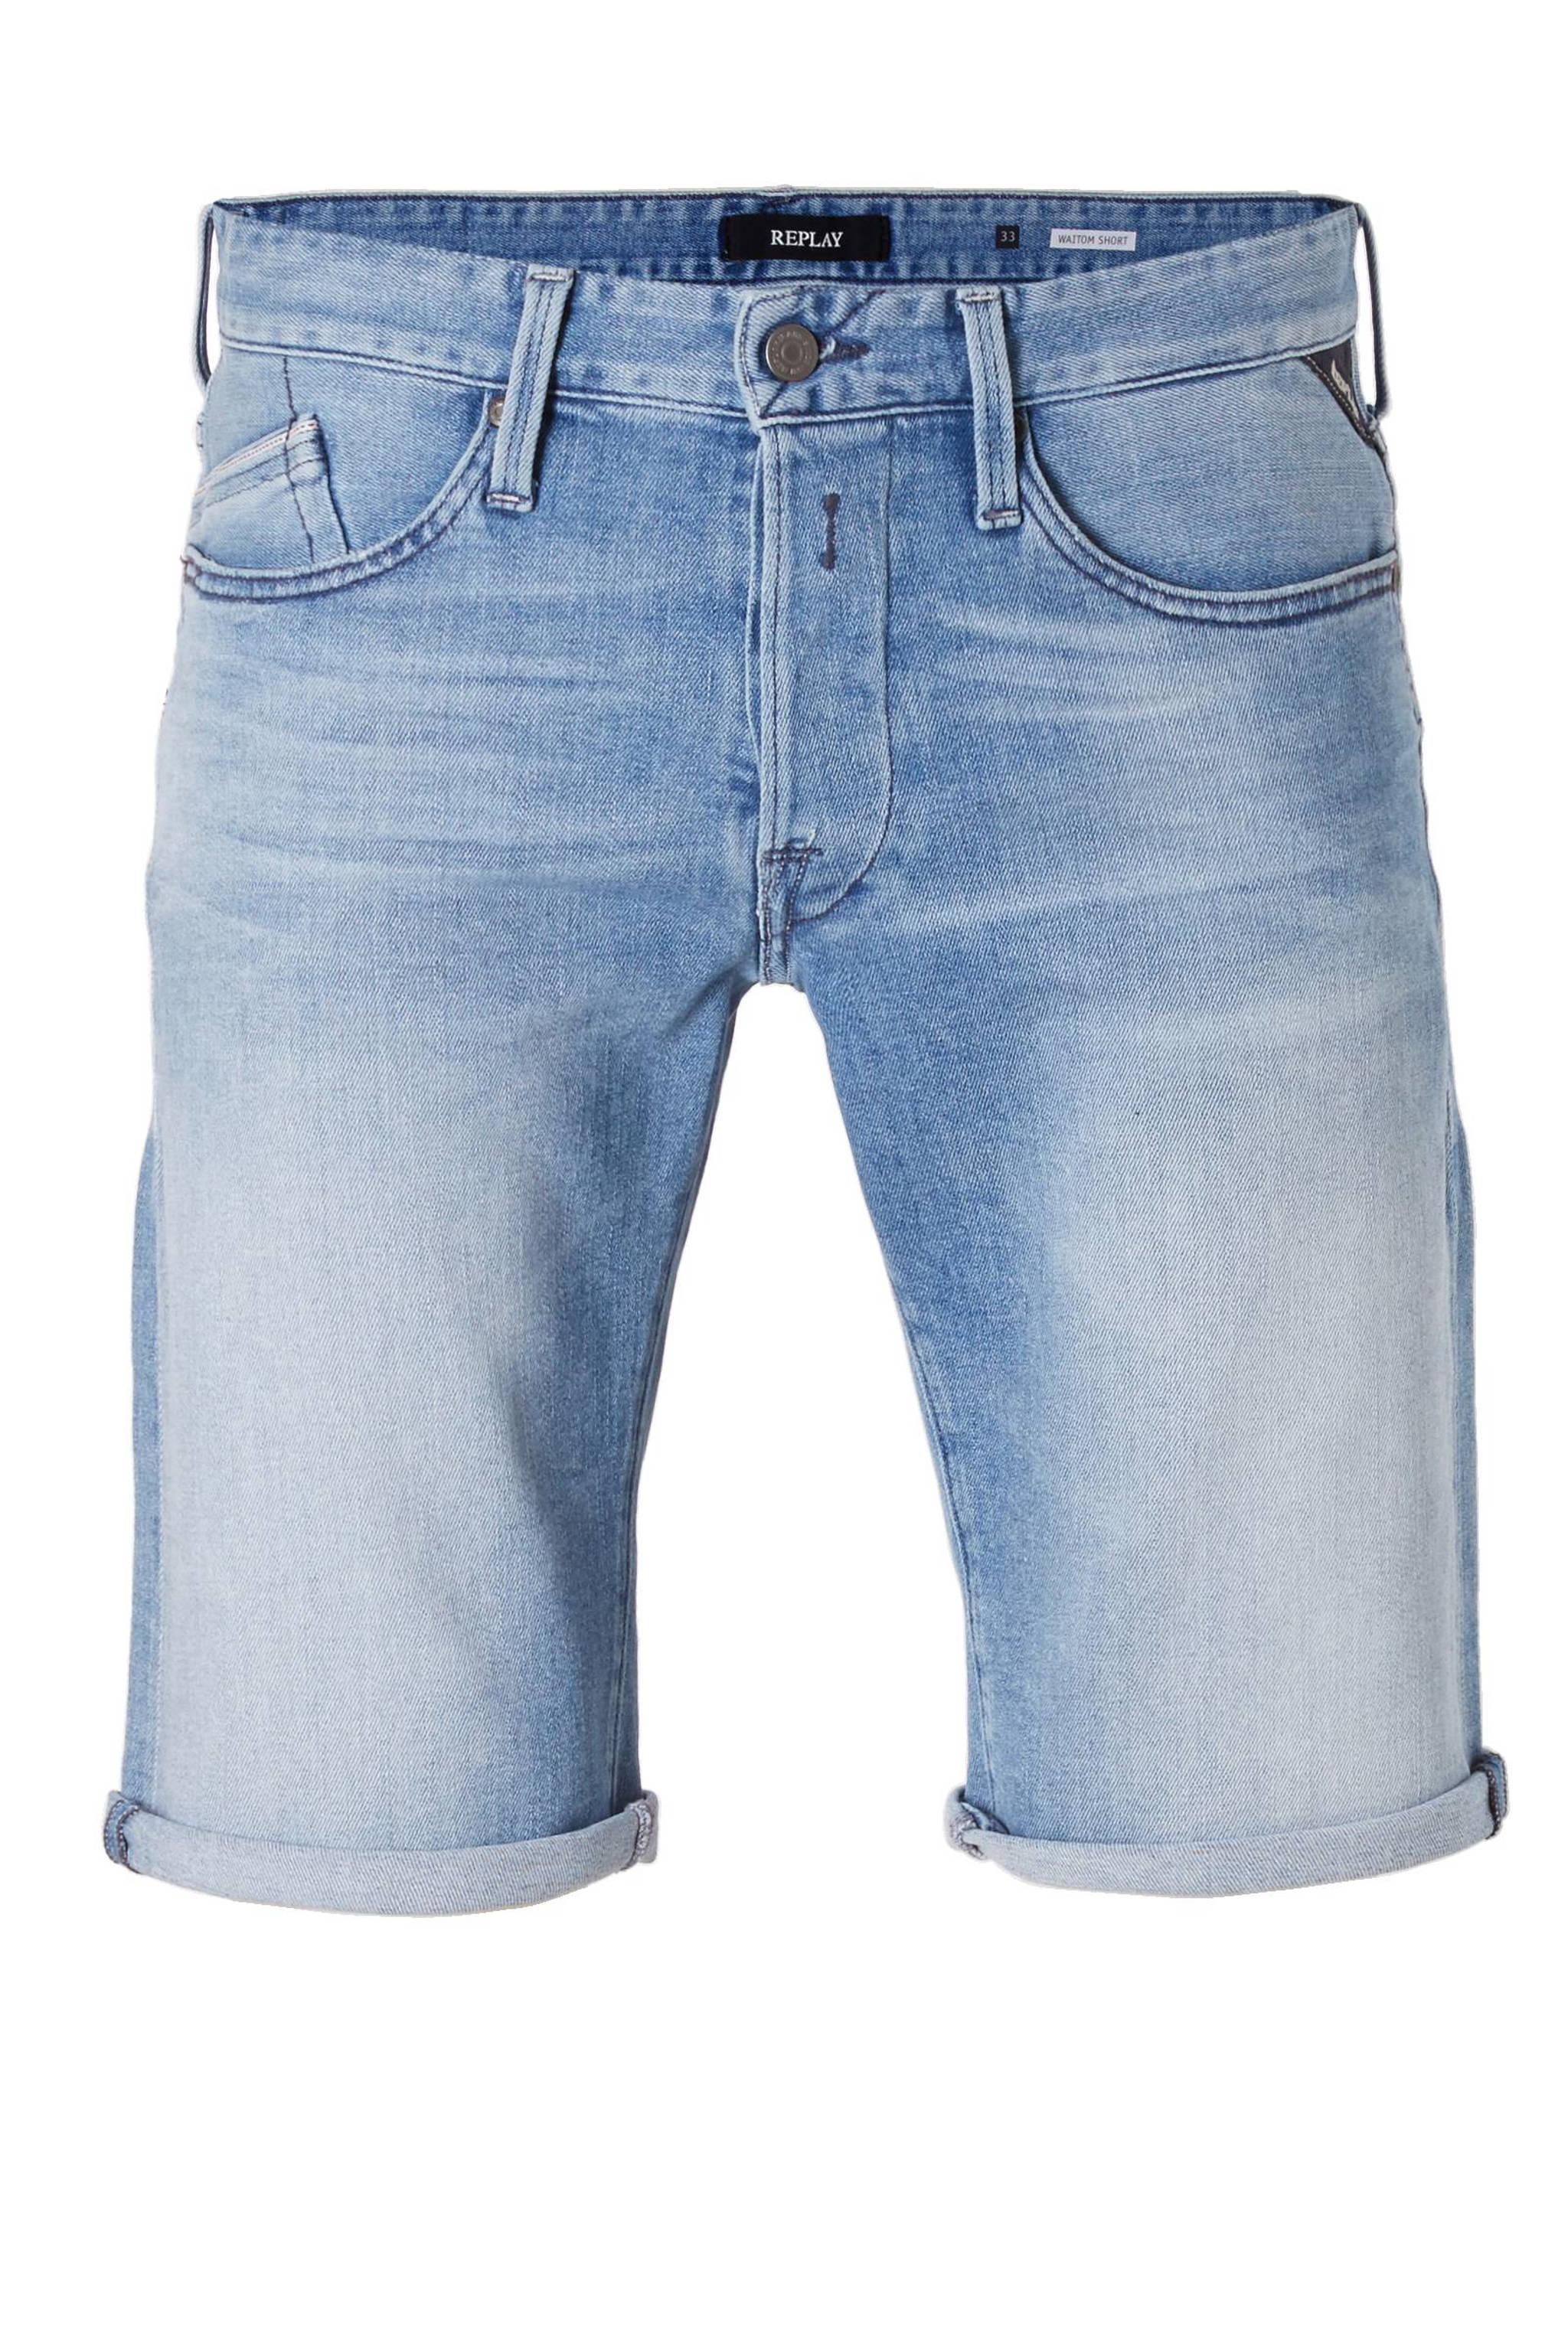 Replay Korte Broek Heren.Replay Slim Fit Jeans Short Waitom Wehkamp